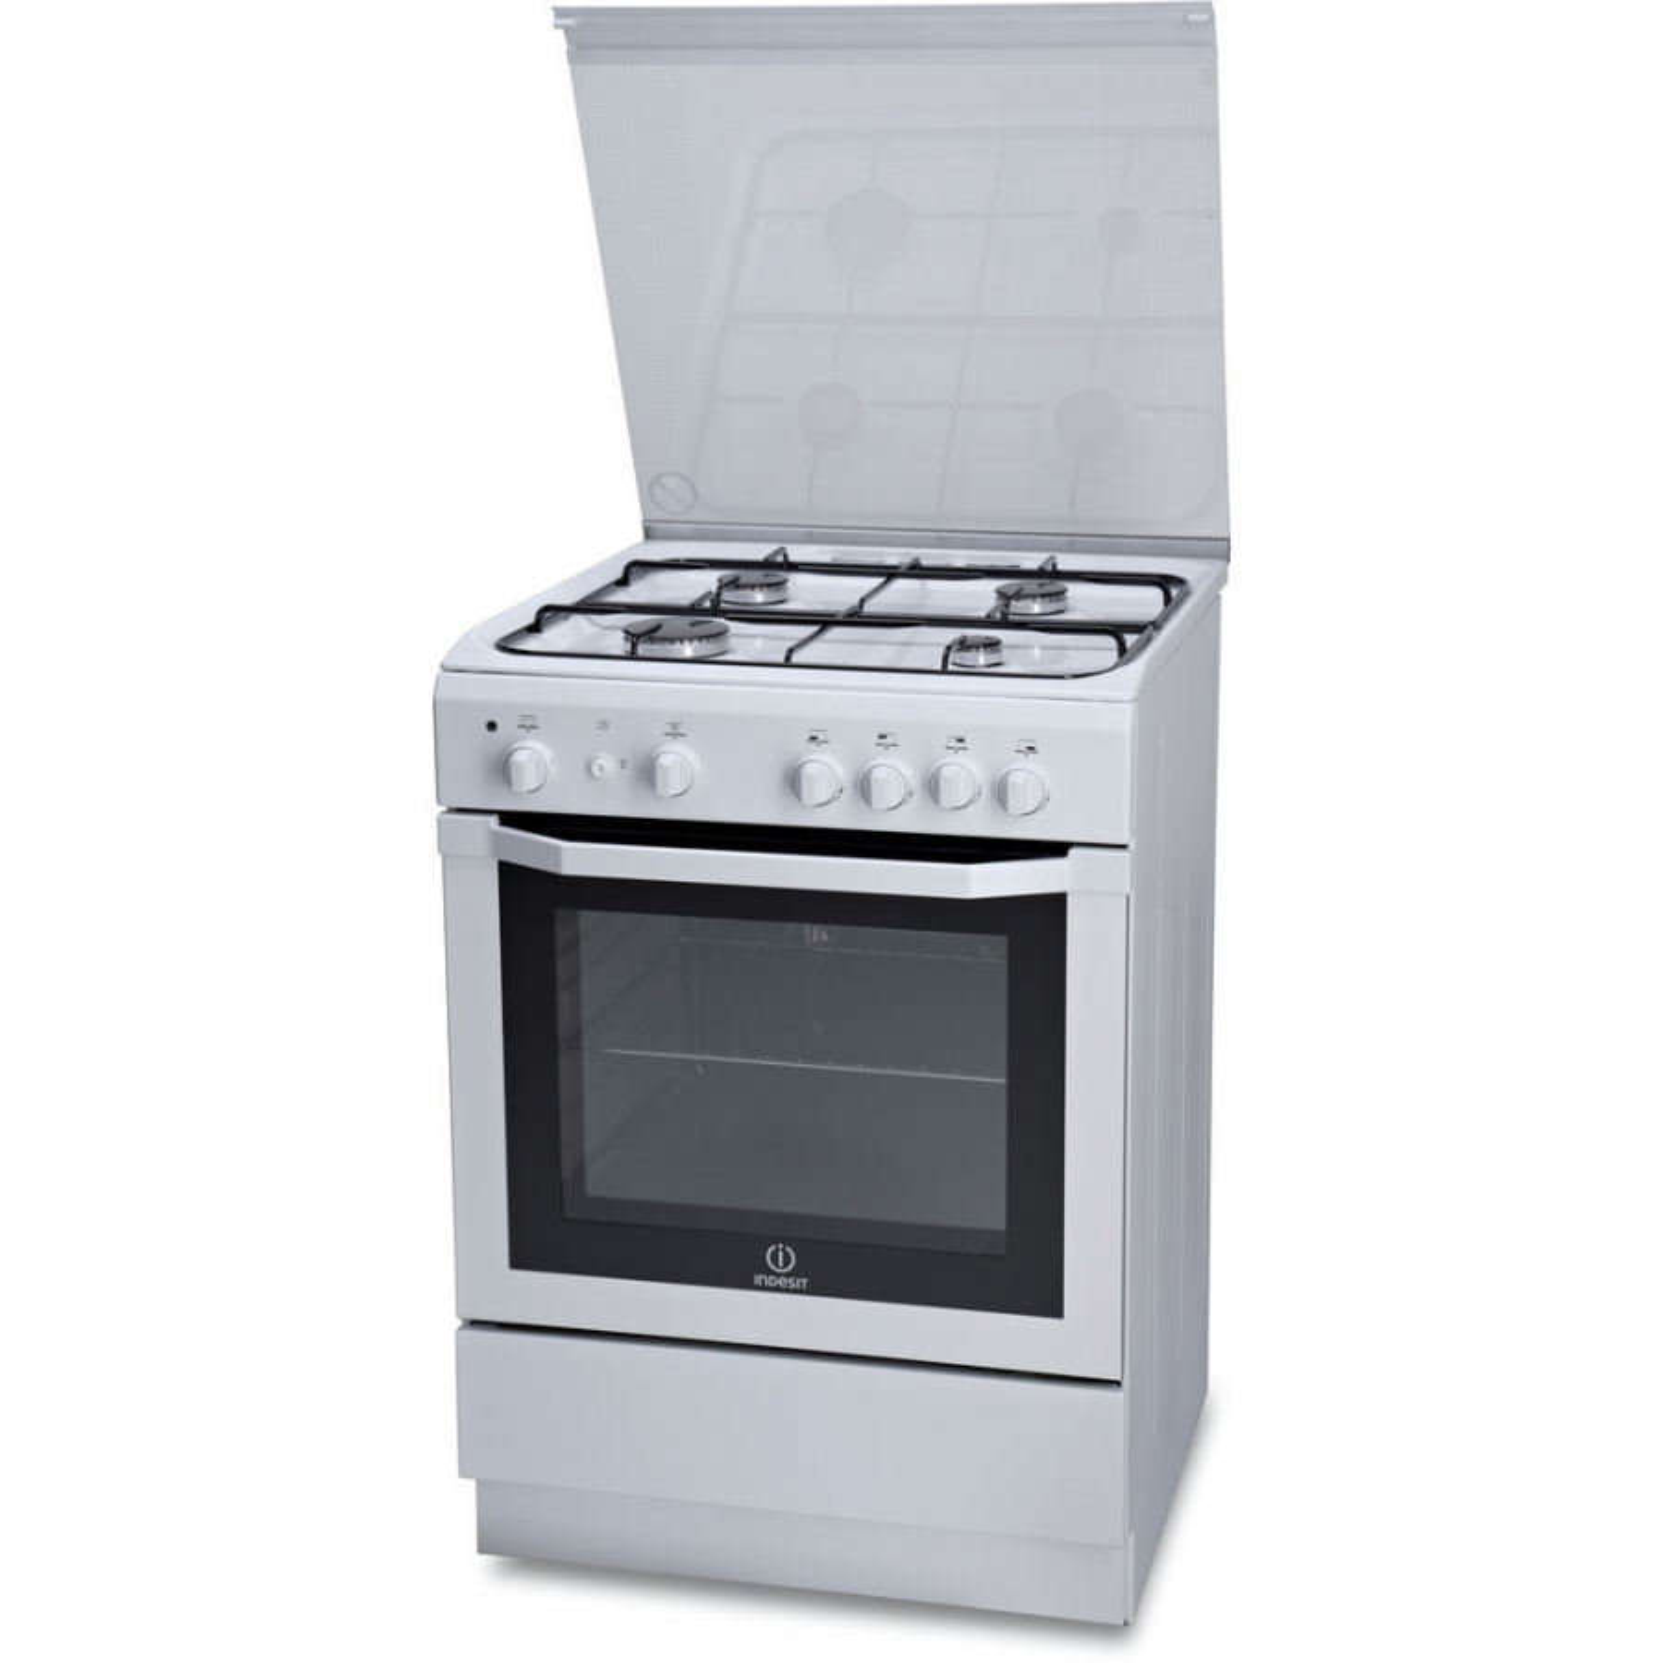 Cucina indesit i6gg1f 1 w i bianca 60x60 4 fuochi forno a gas garanzia italia promo - Cucine a gas samsung ...